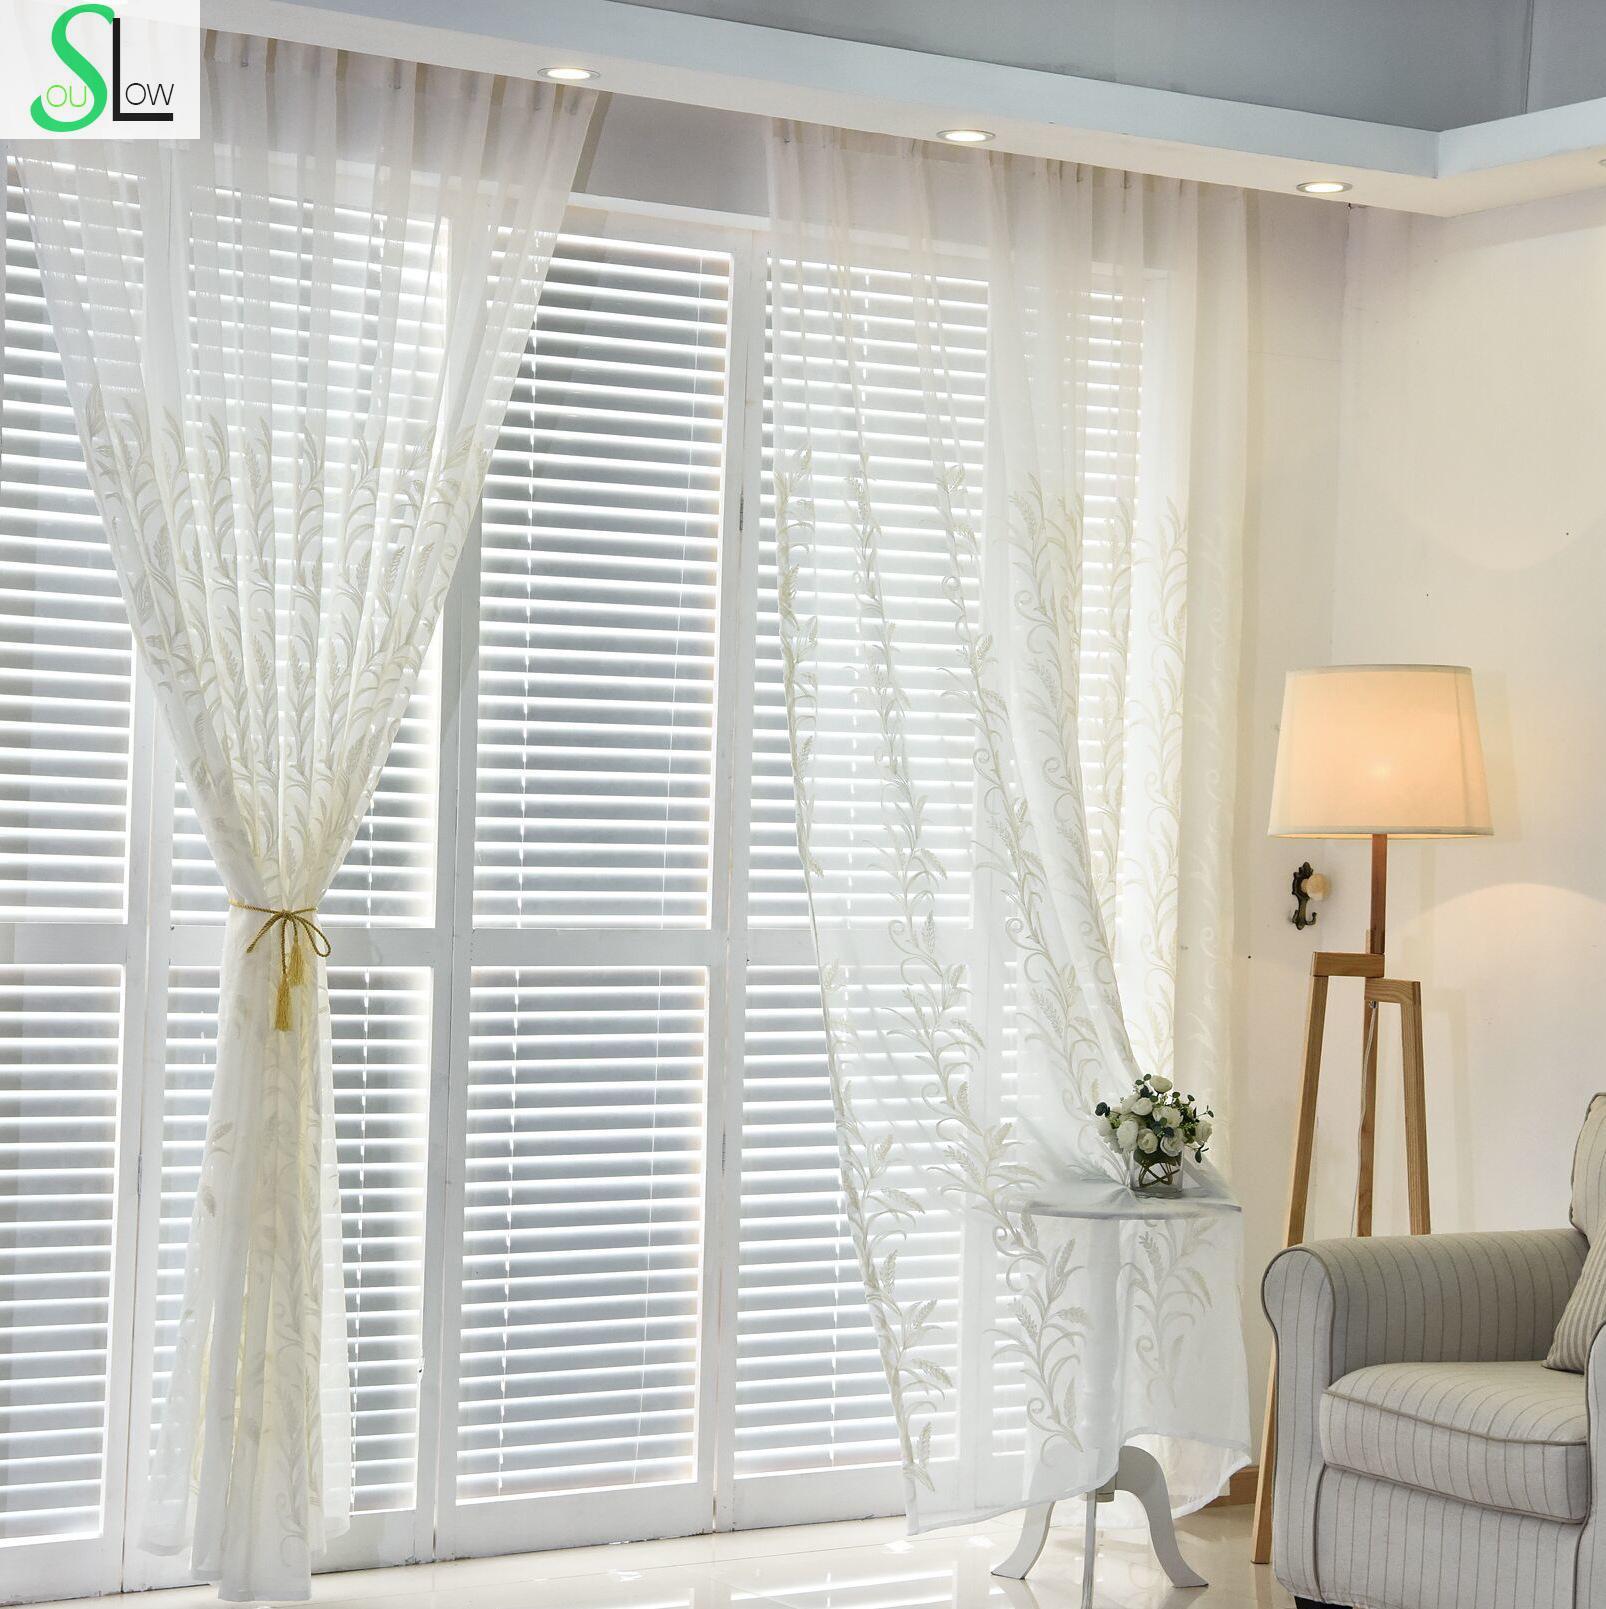 Slow Soul White Blue Light Brown Modern Cotton Curtain Living Room ...